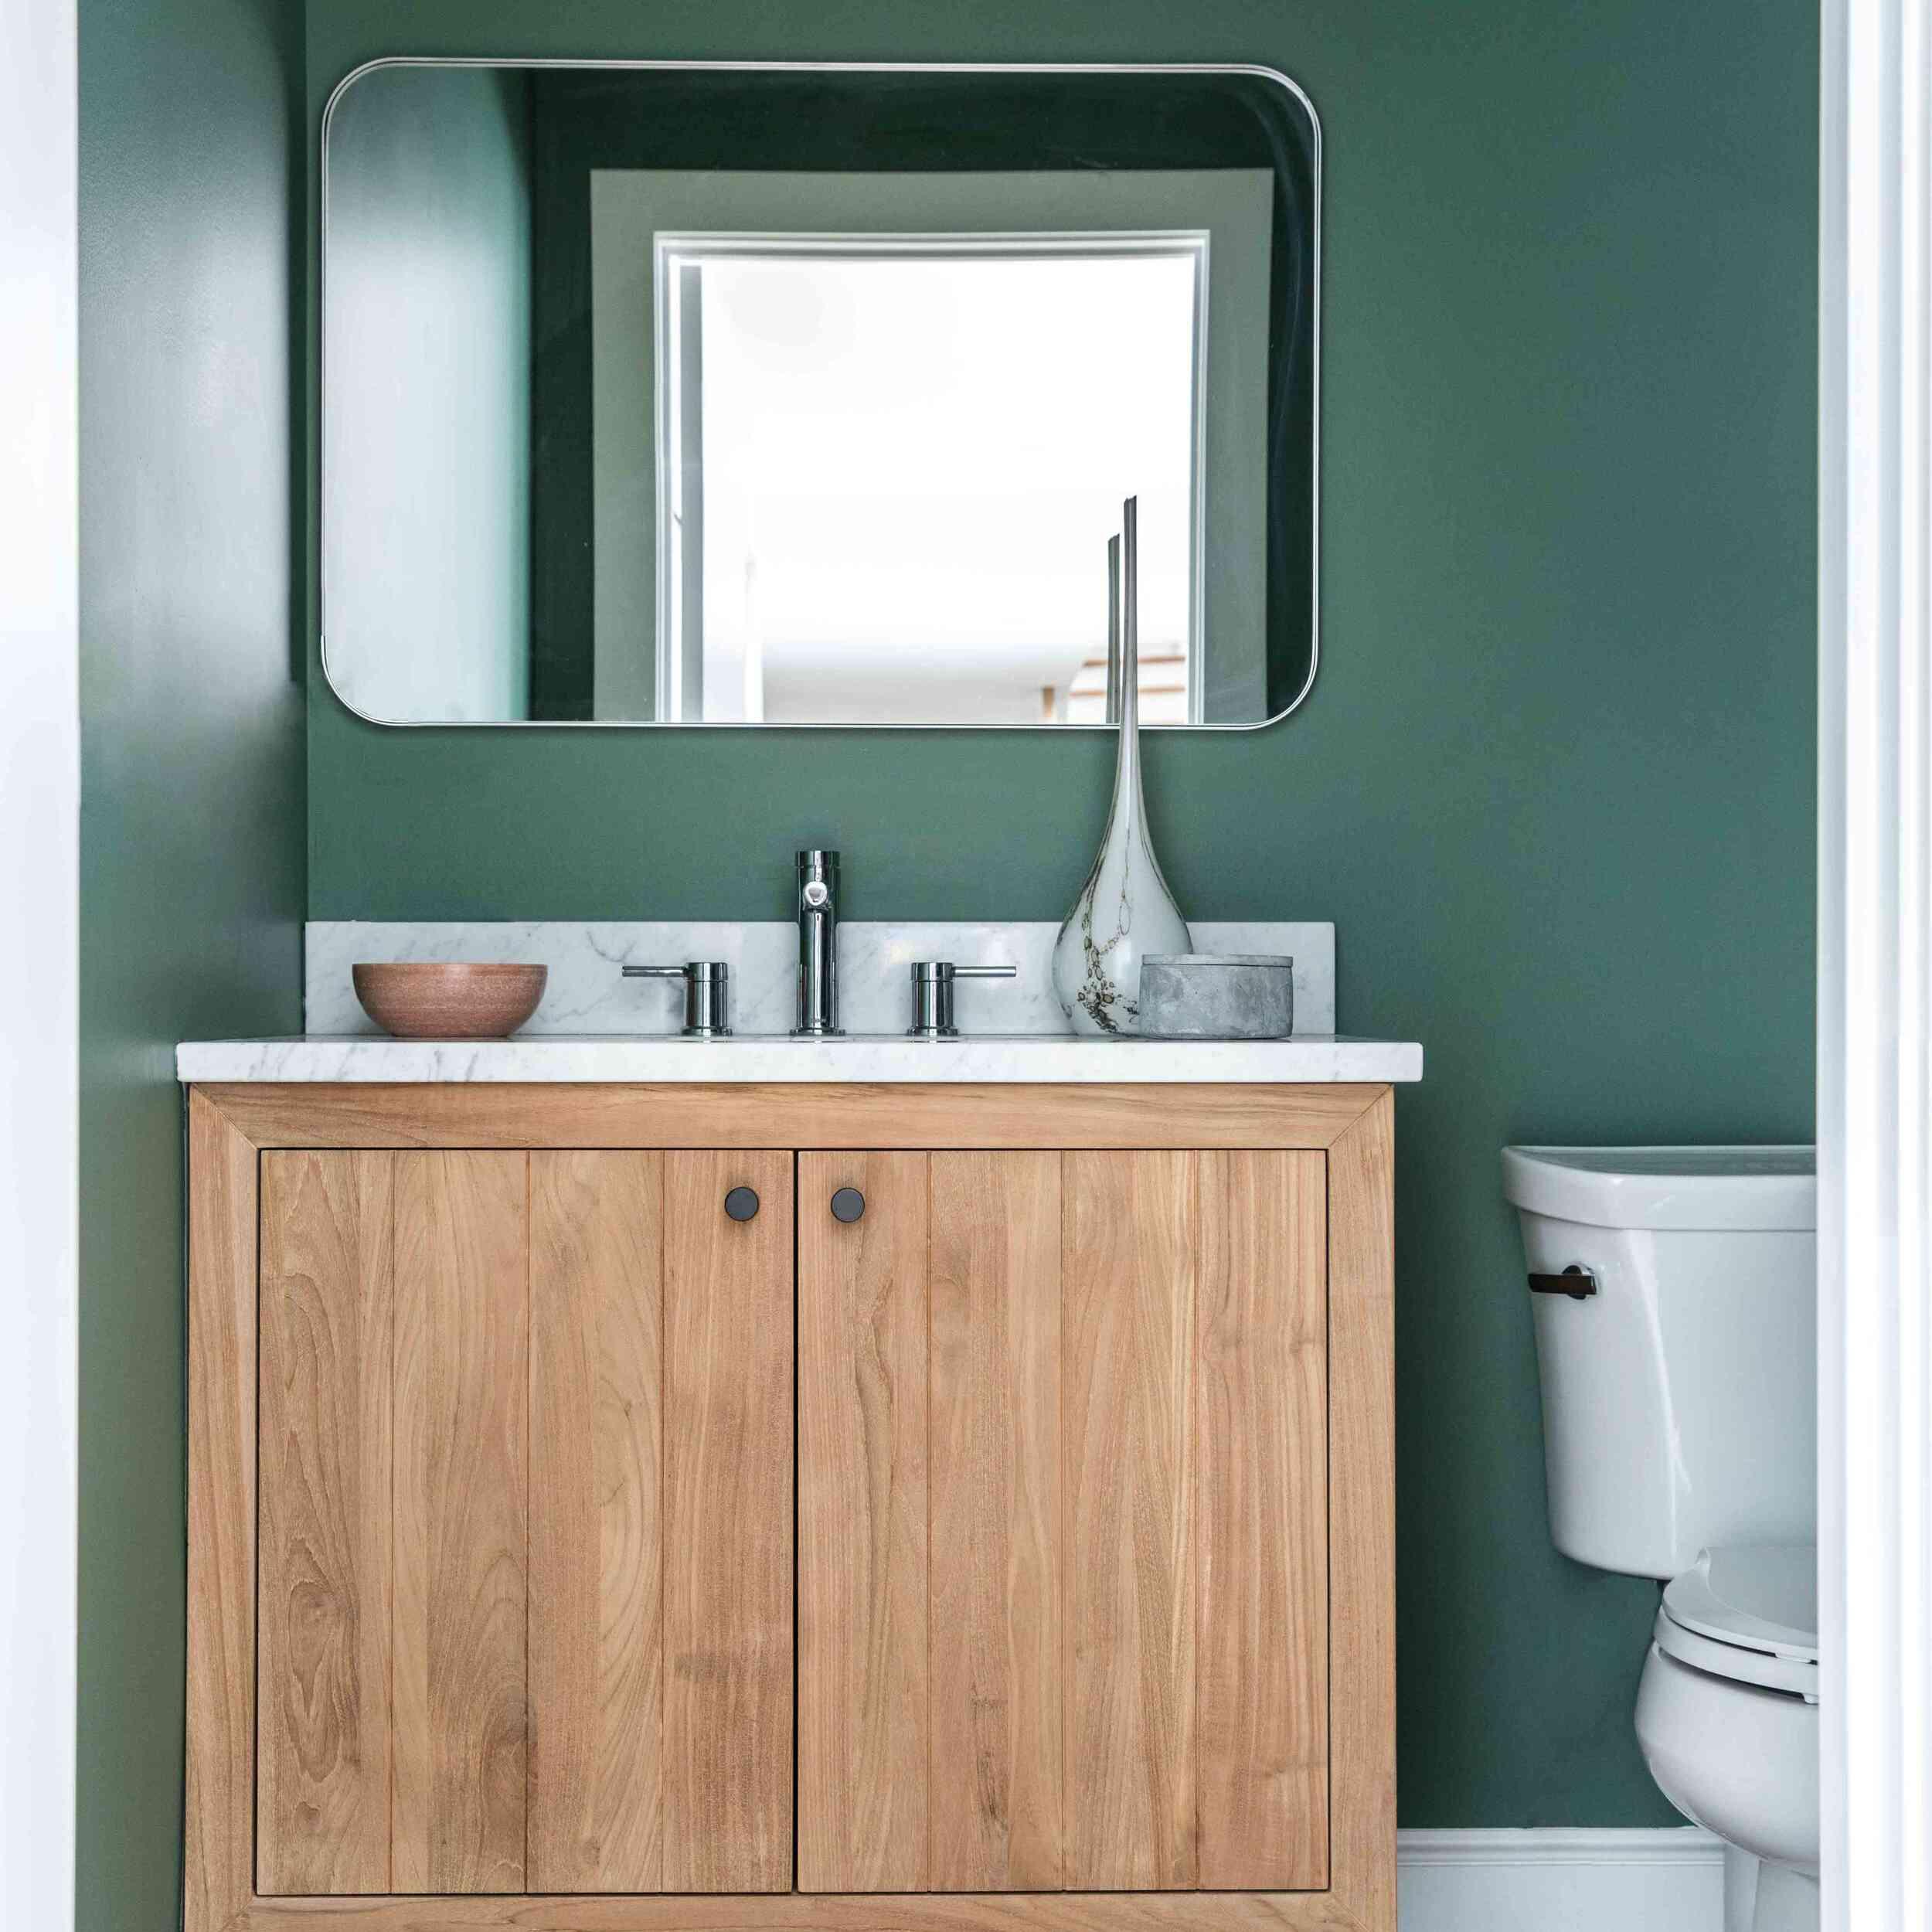 A half-bathroom with dark green walls